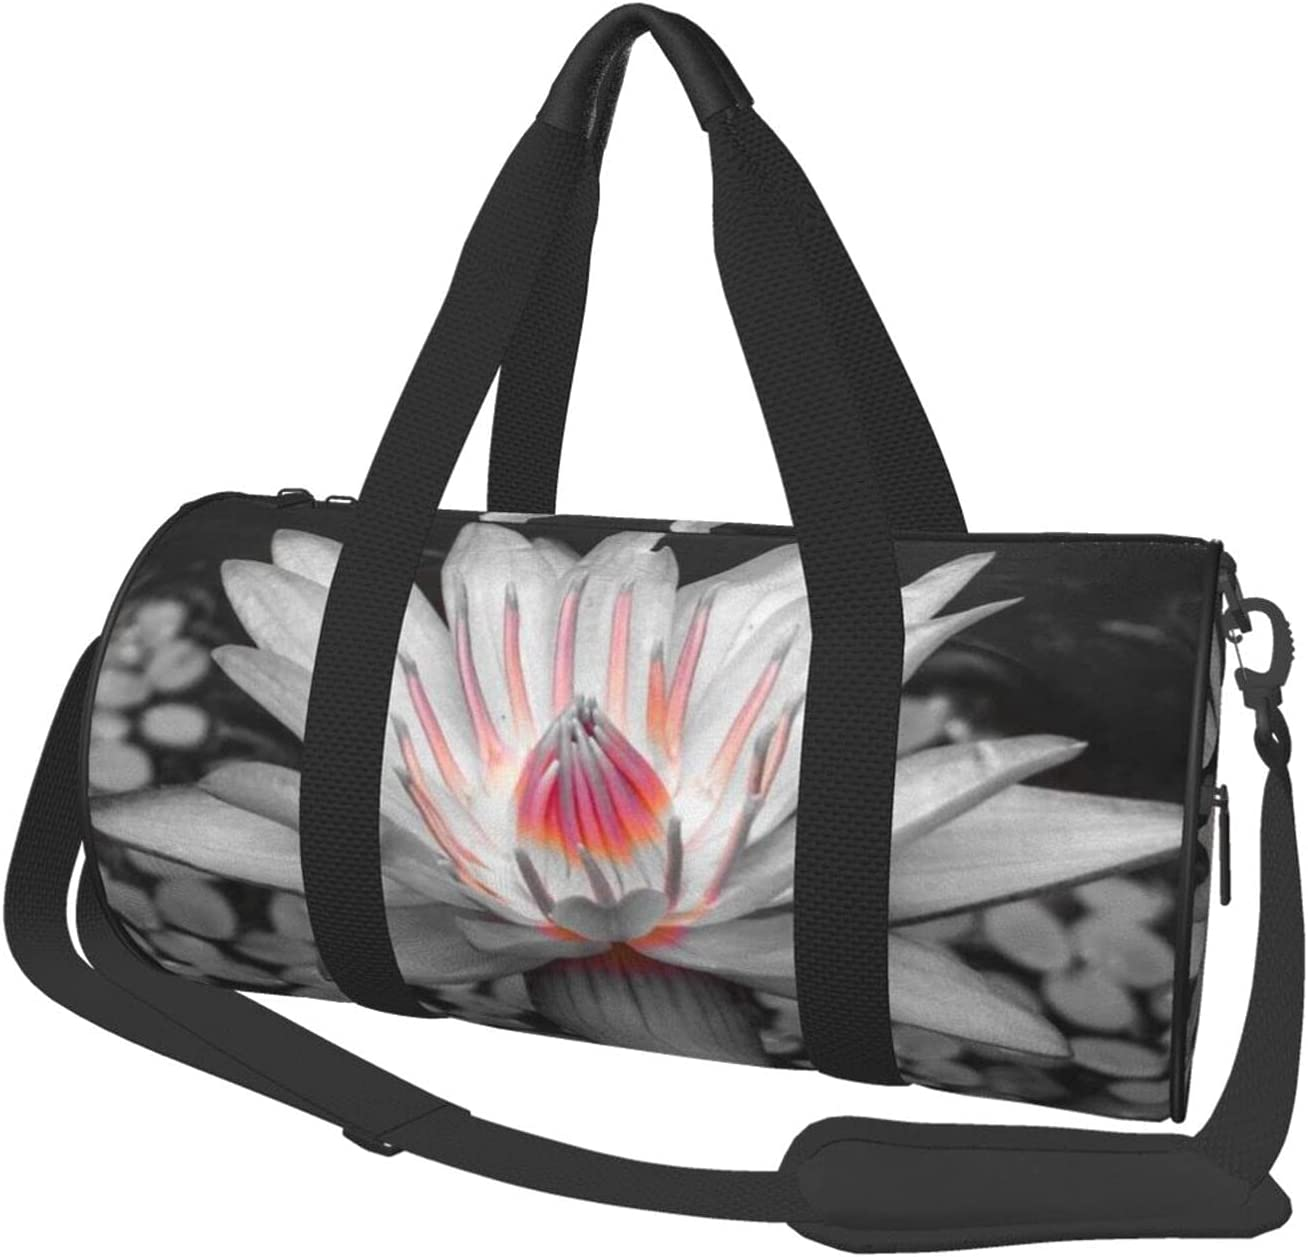 Round Sports Gym Bag Pink Lily Recommended Limited price sale Shoulder Tote We Handbag Yoga